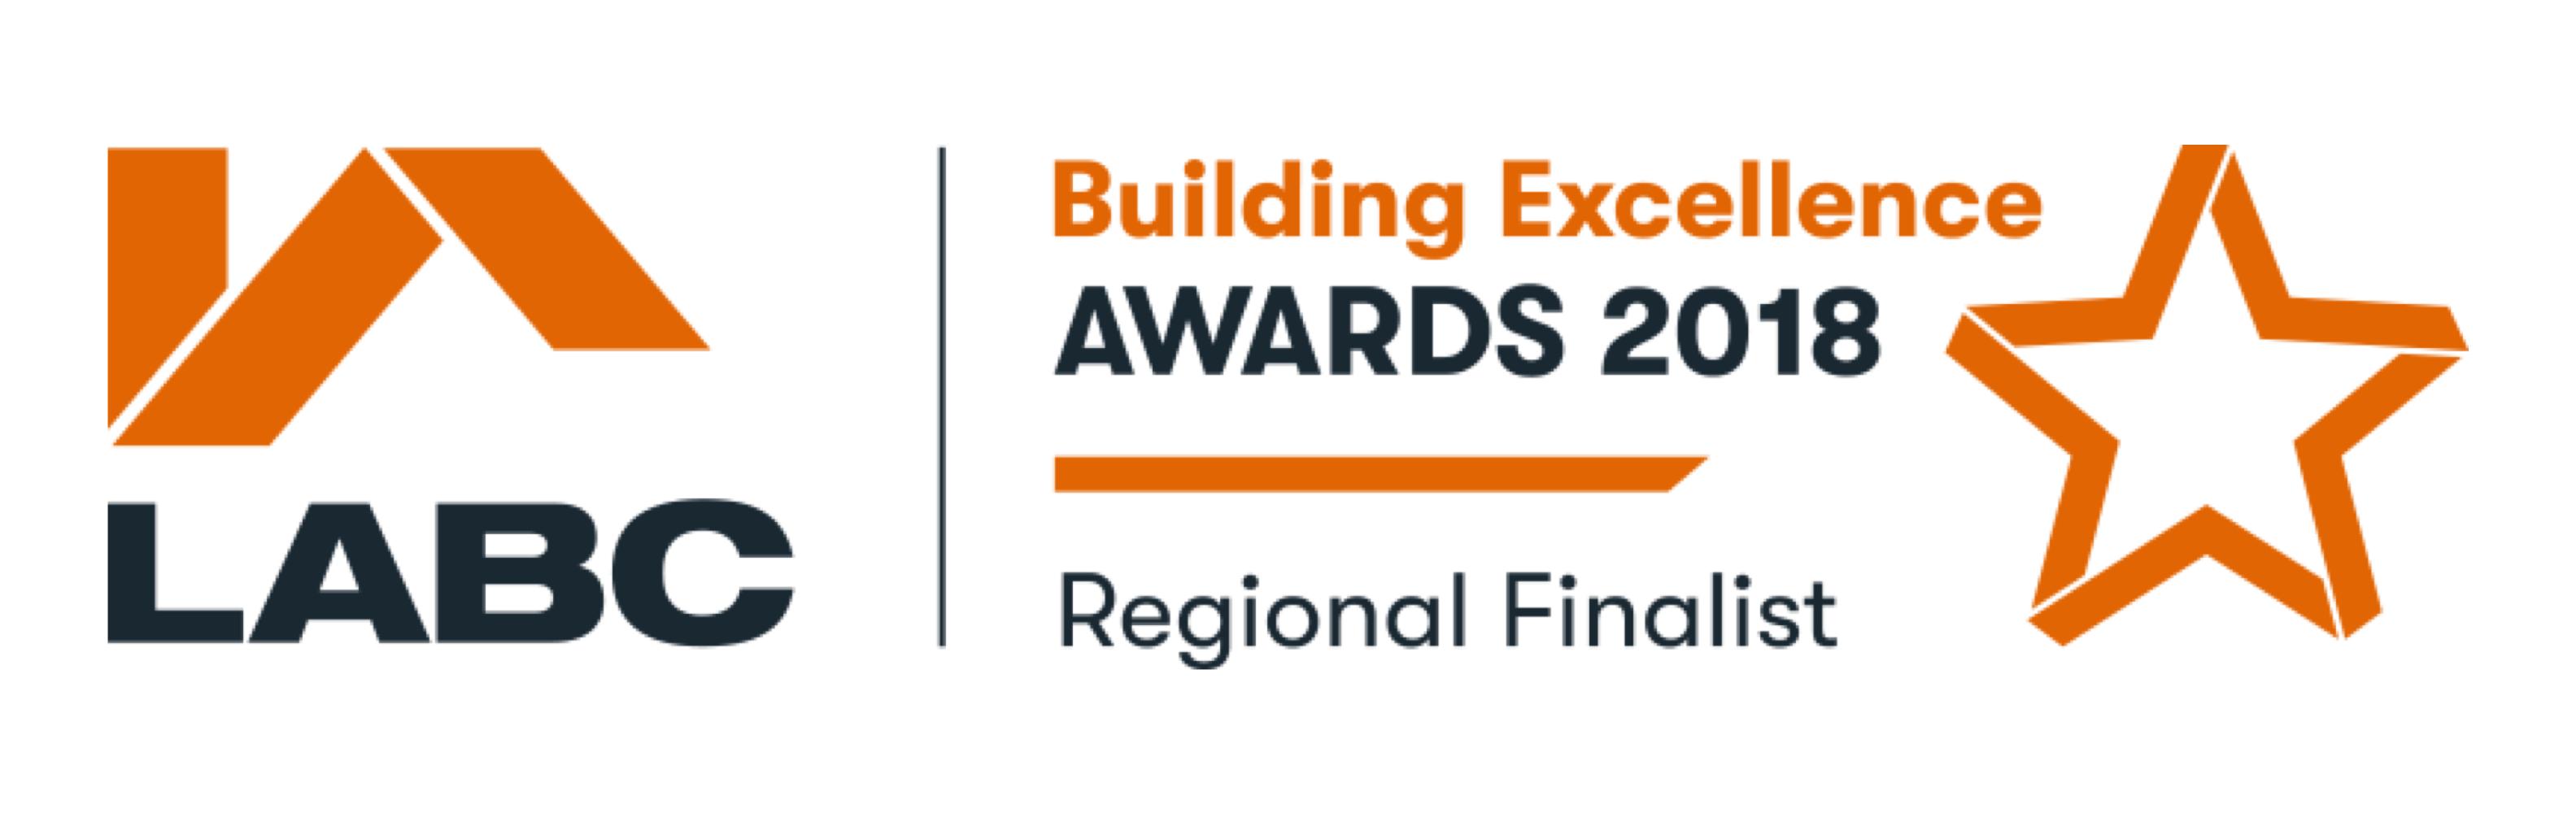 labc_awards-regional-finalist-3.png